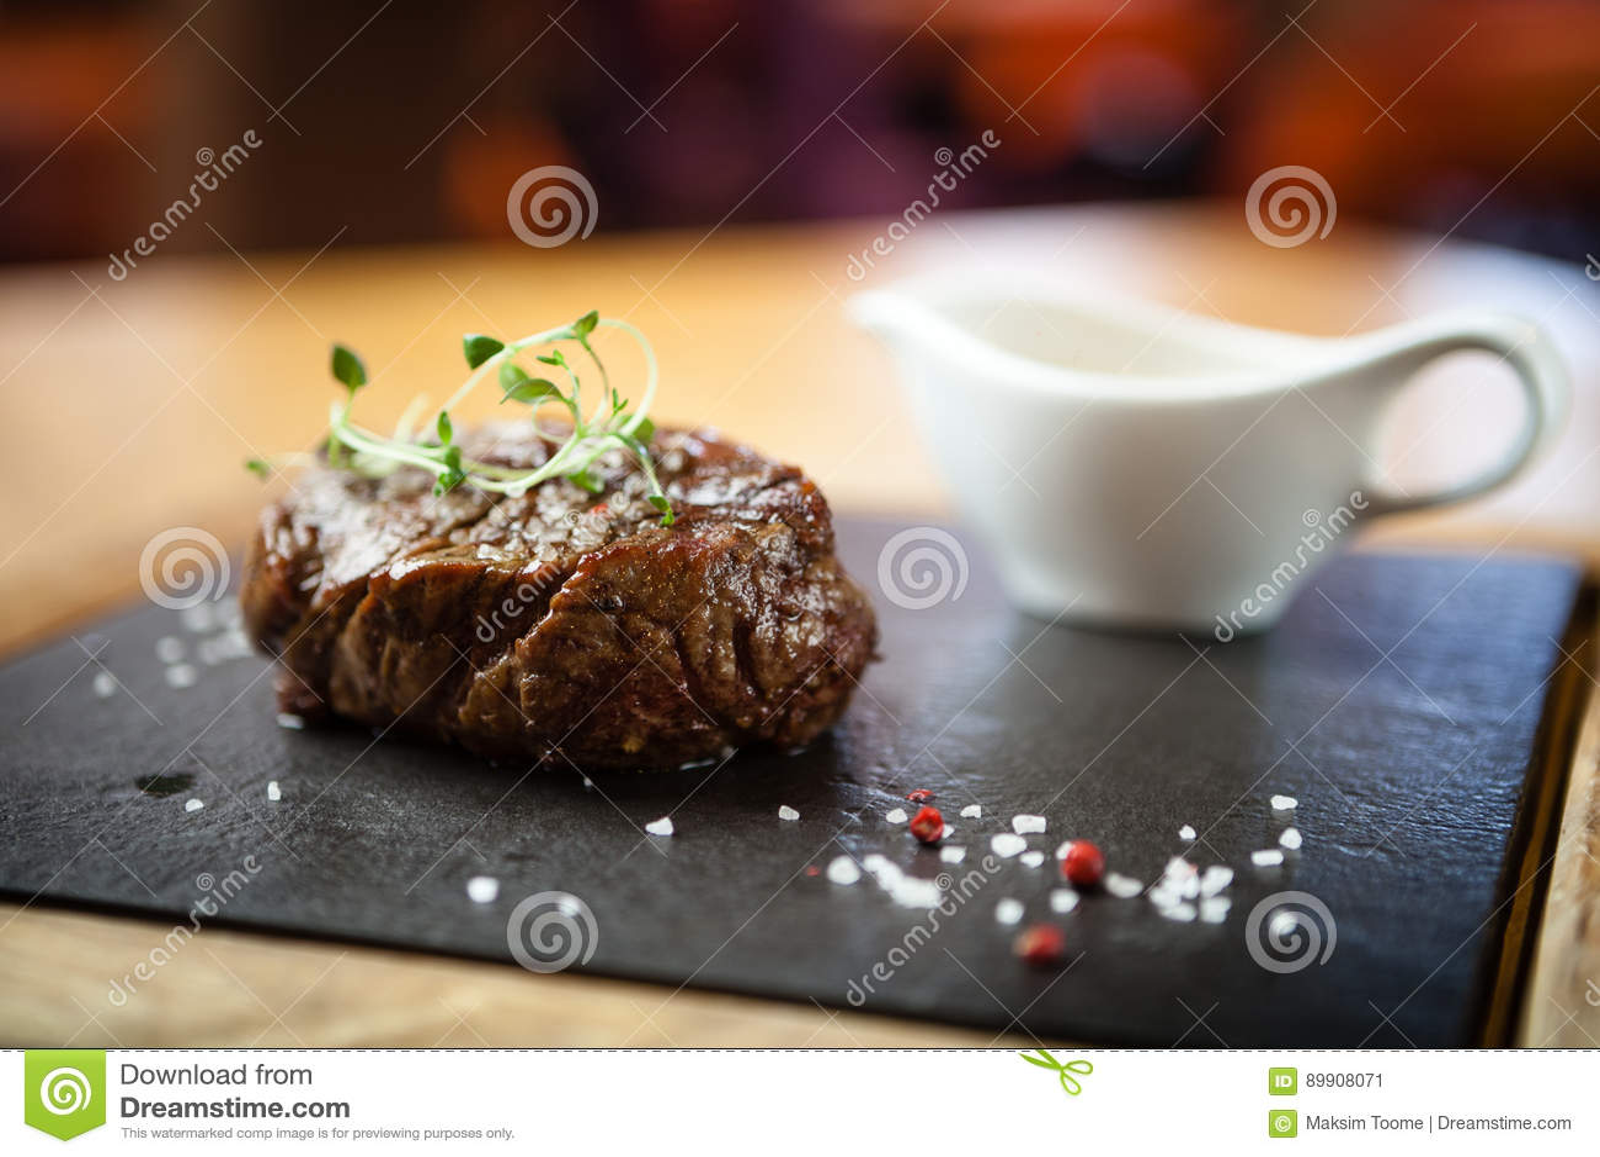 Filet mignon meal